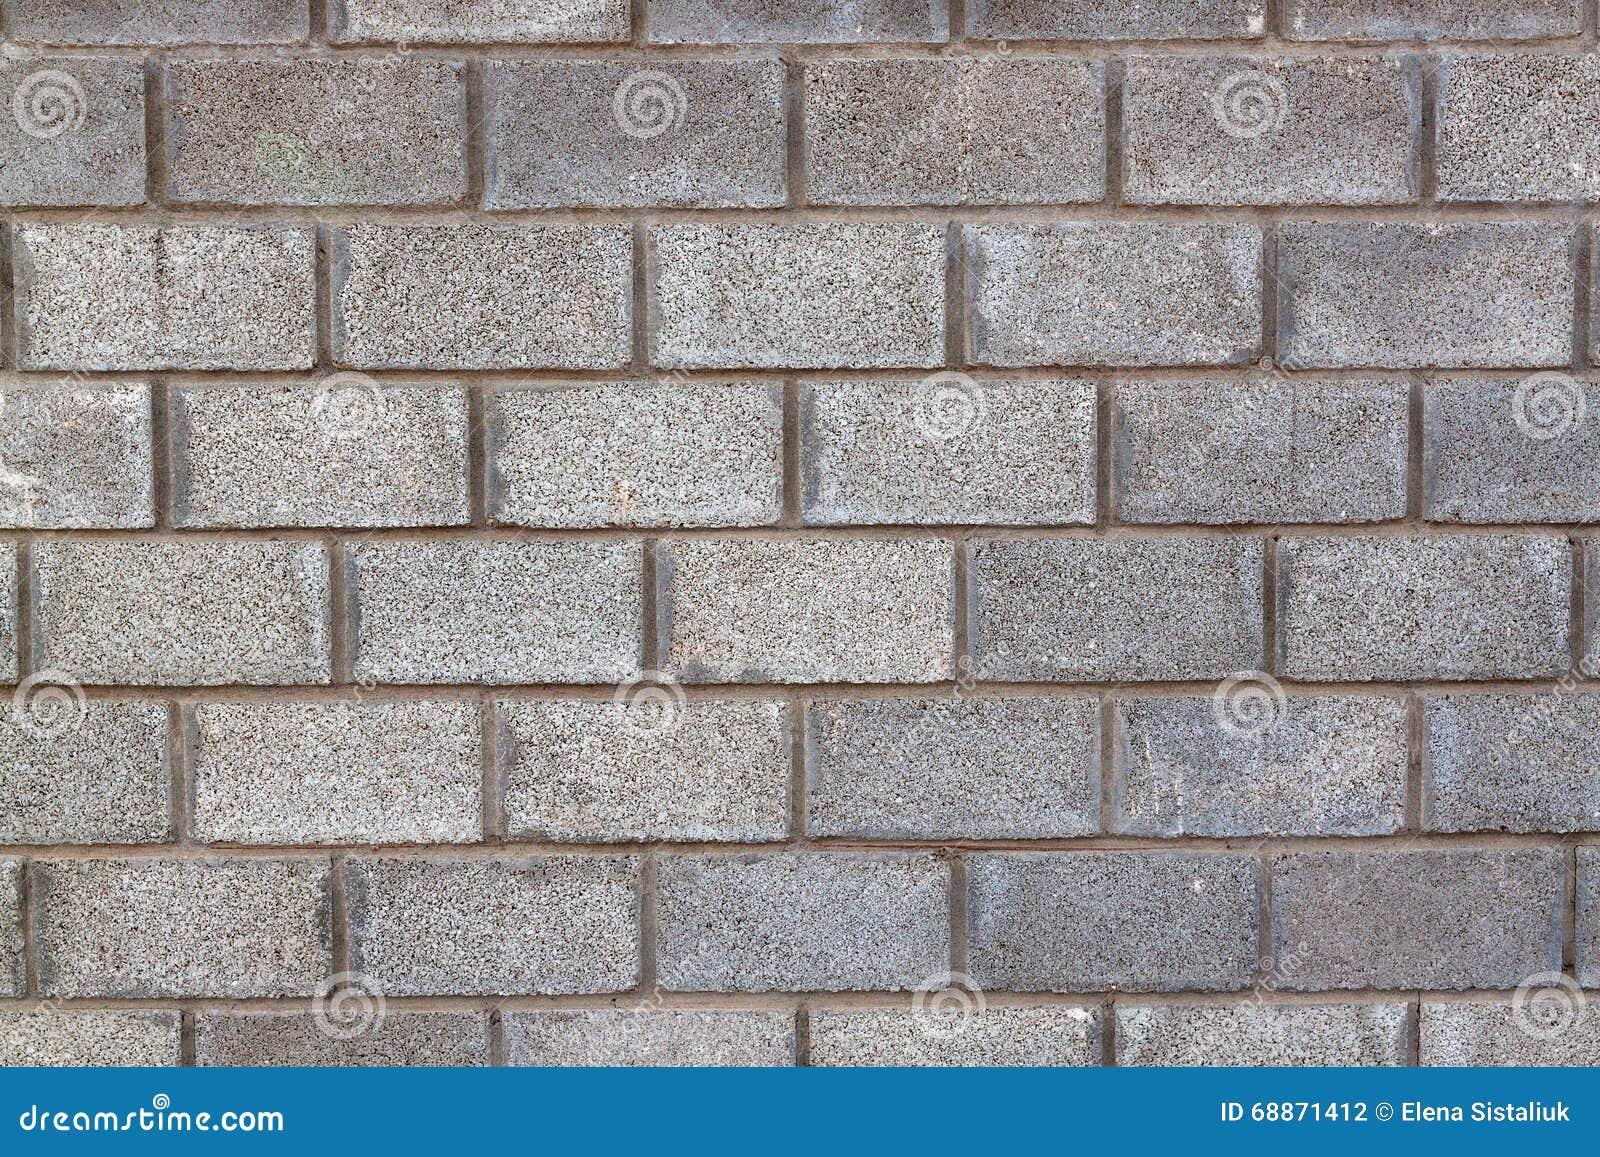 Bloques de cemento grises pared textura del fondo foto de - Cemento decorativo para paredes ...